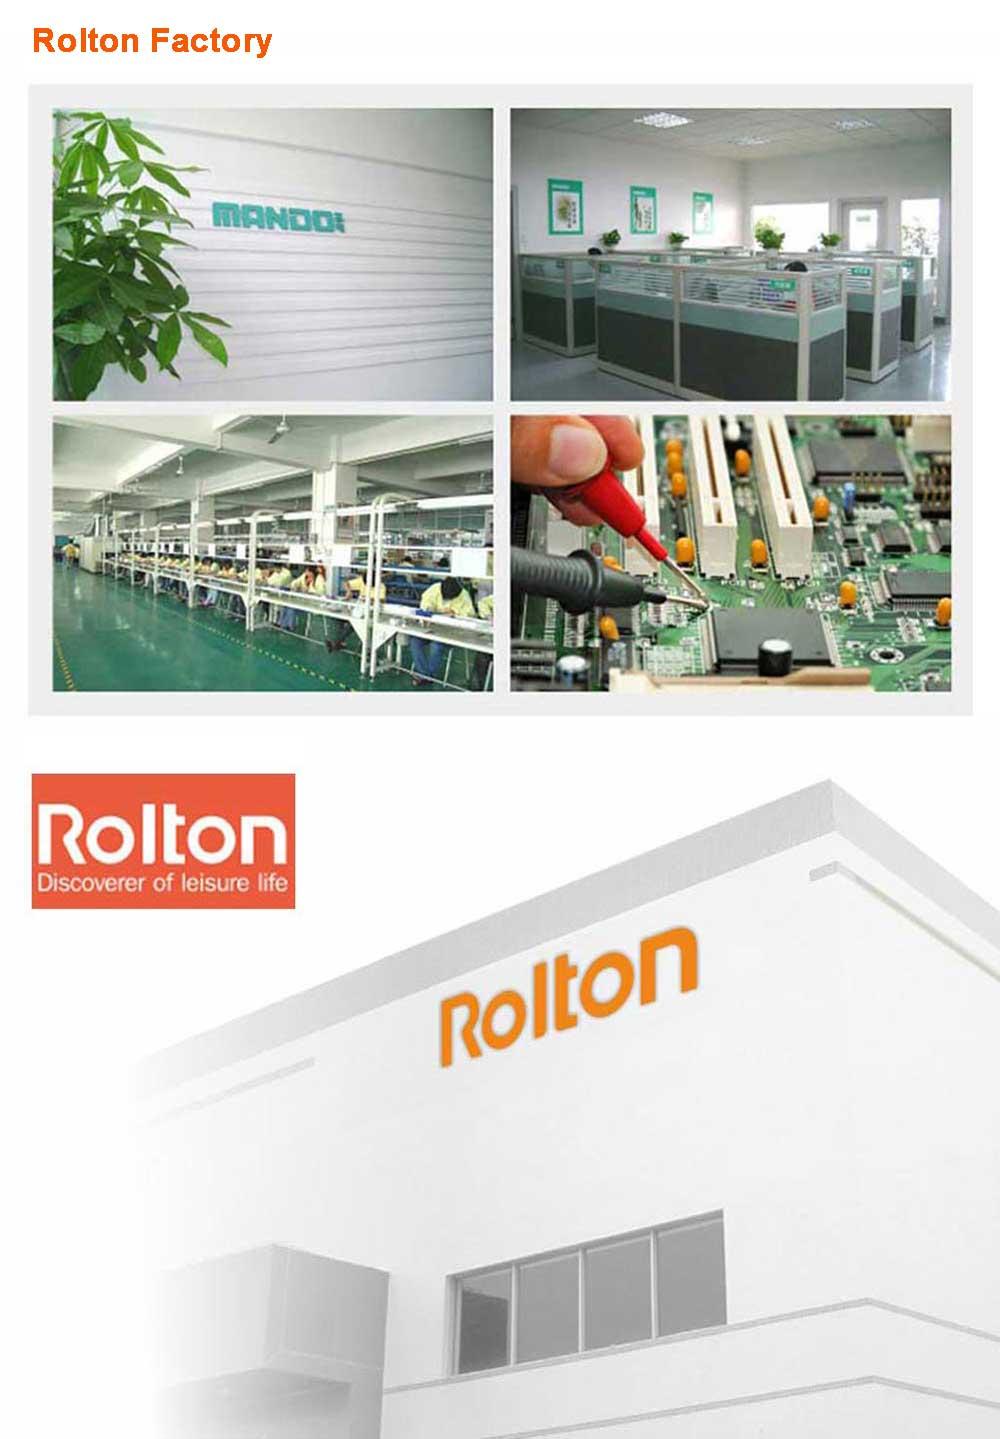 Rolton-1000